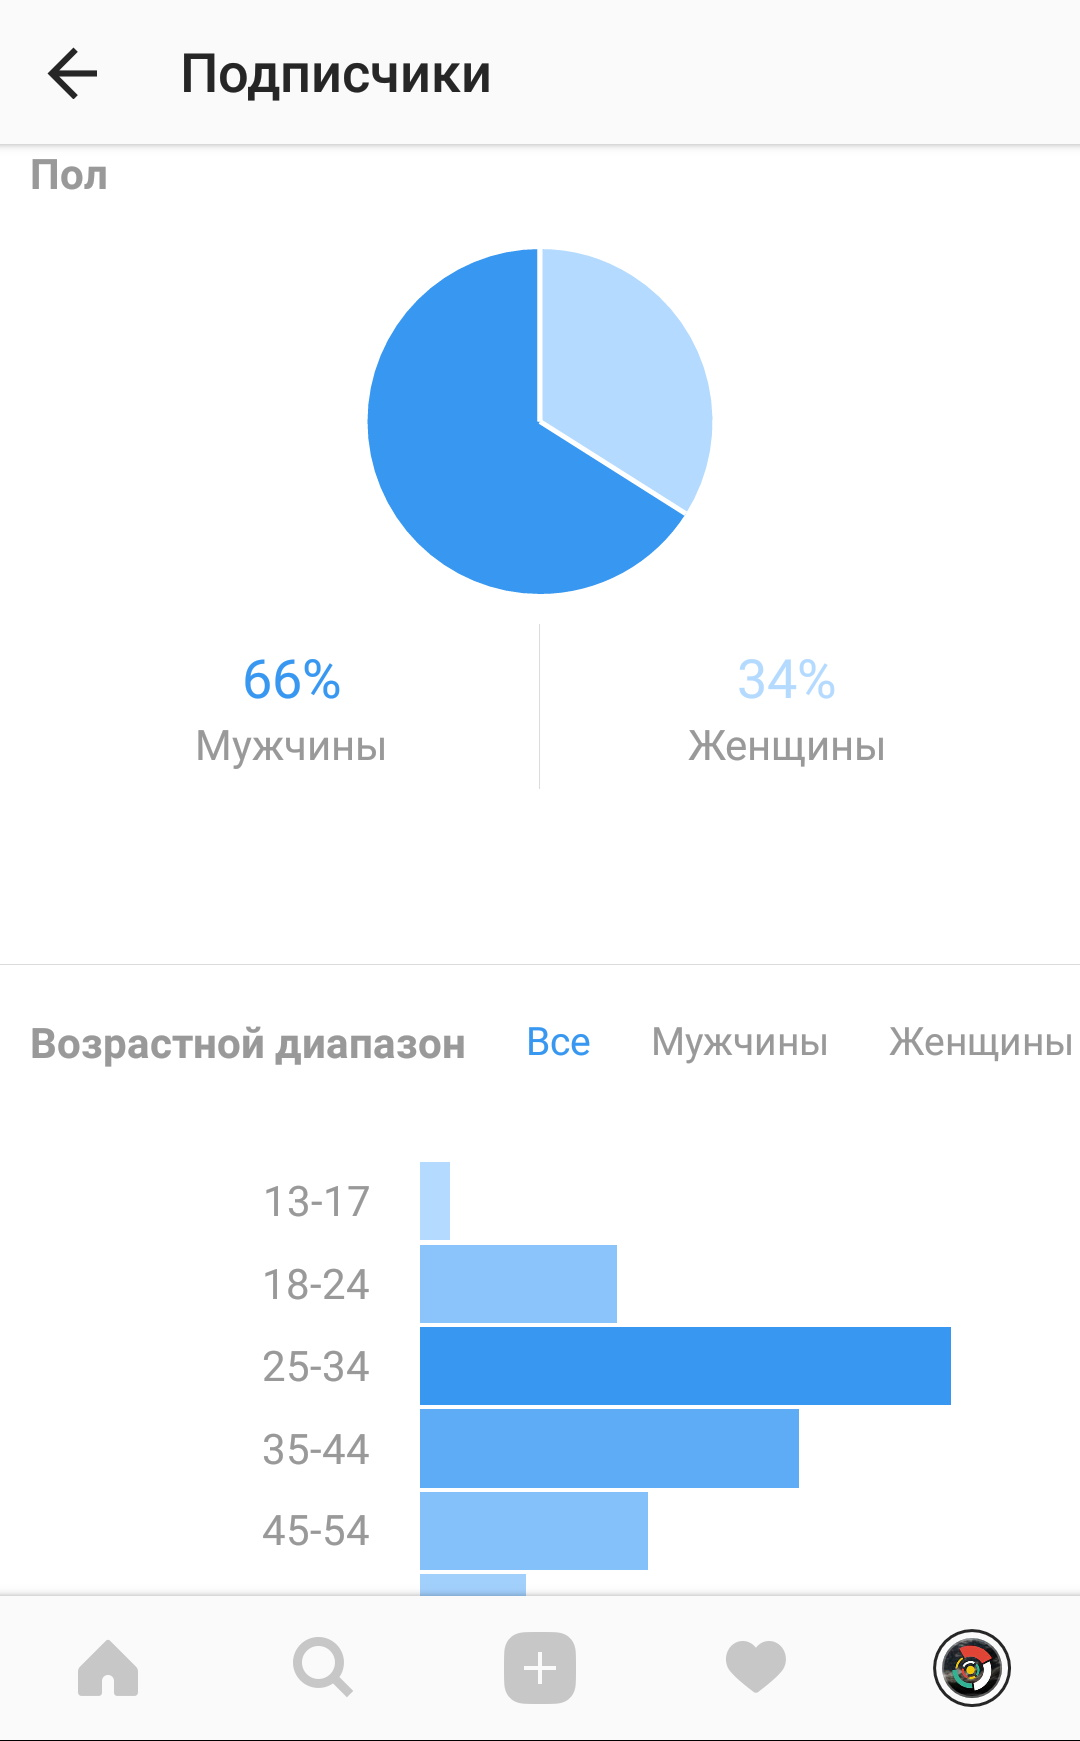 статистика по подписчикам